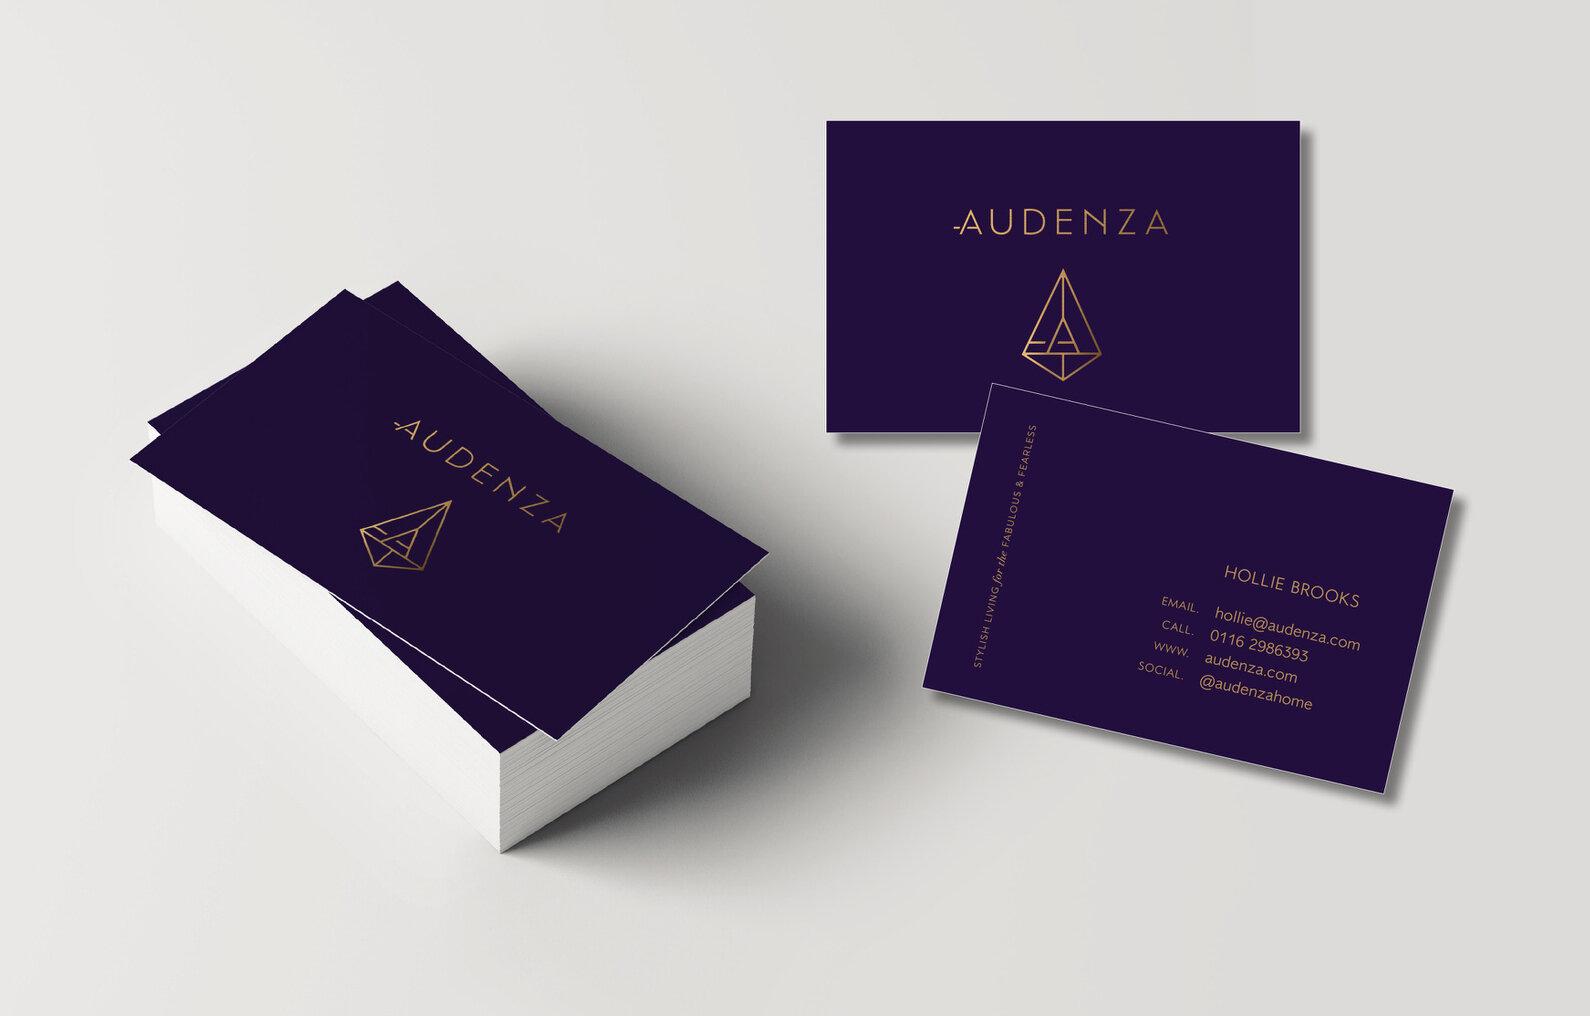 Audenza_6-1.jpg